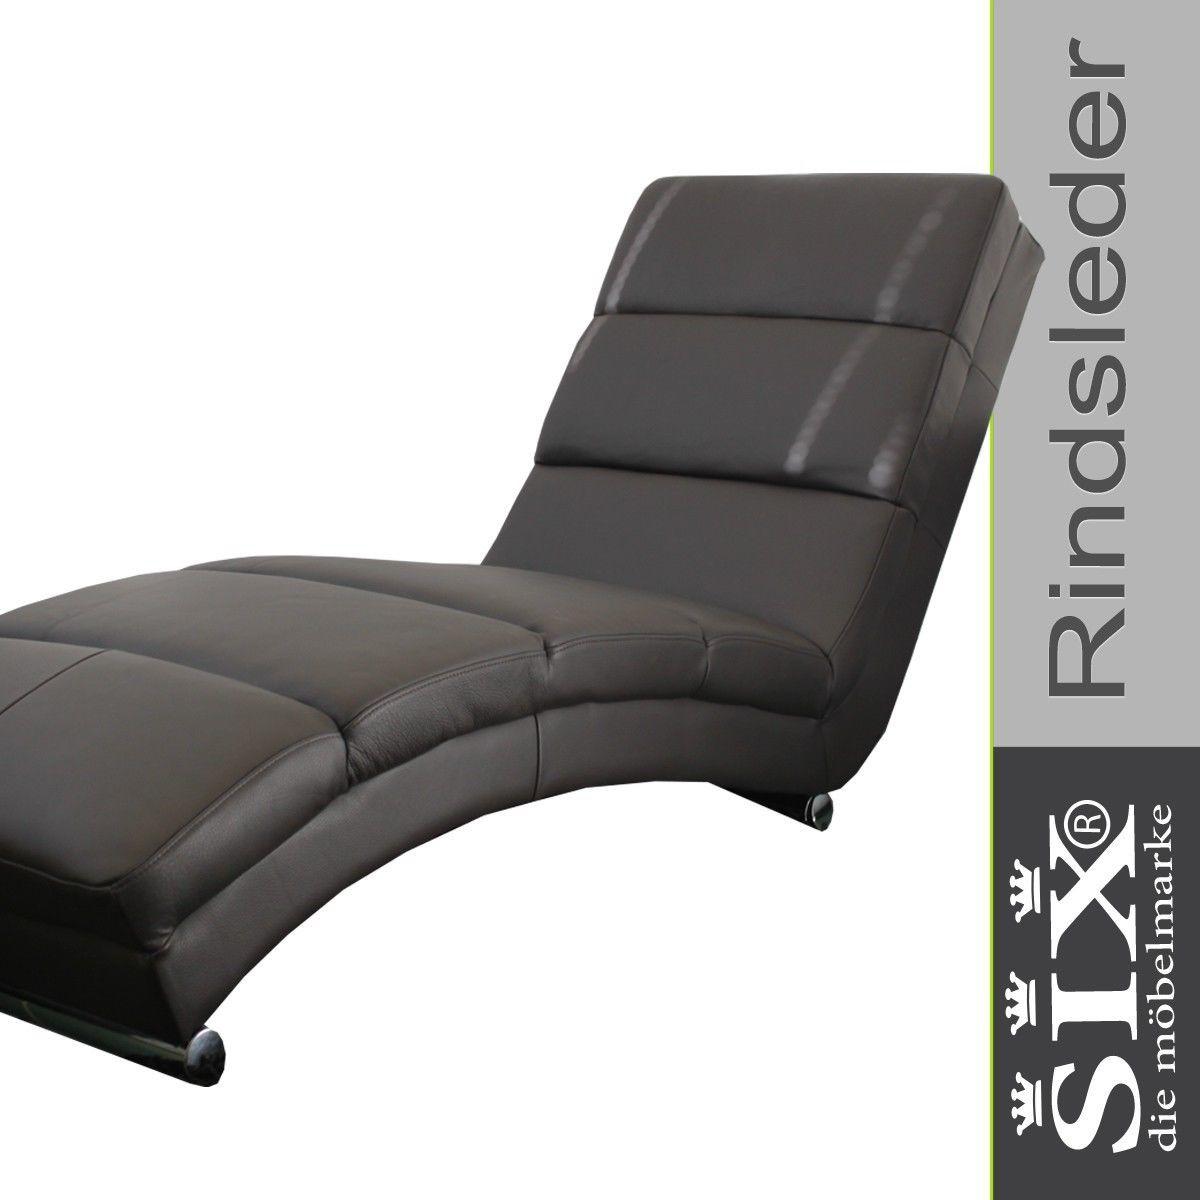 relaxliege italy spa leder braun. Black Bedroom Furniture Sets. Home Design Ideas